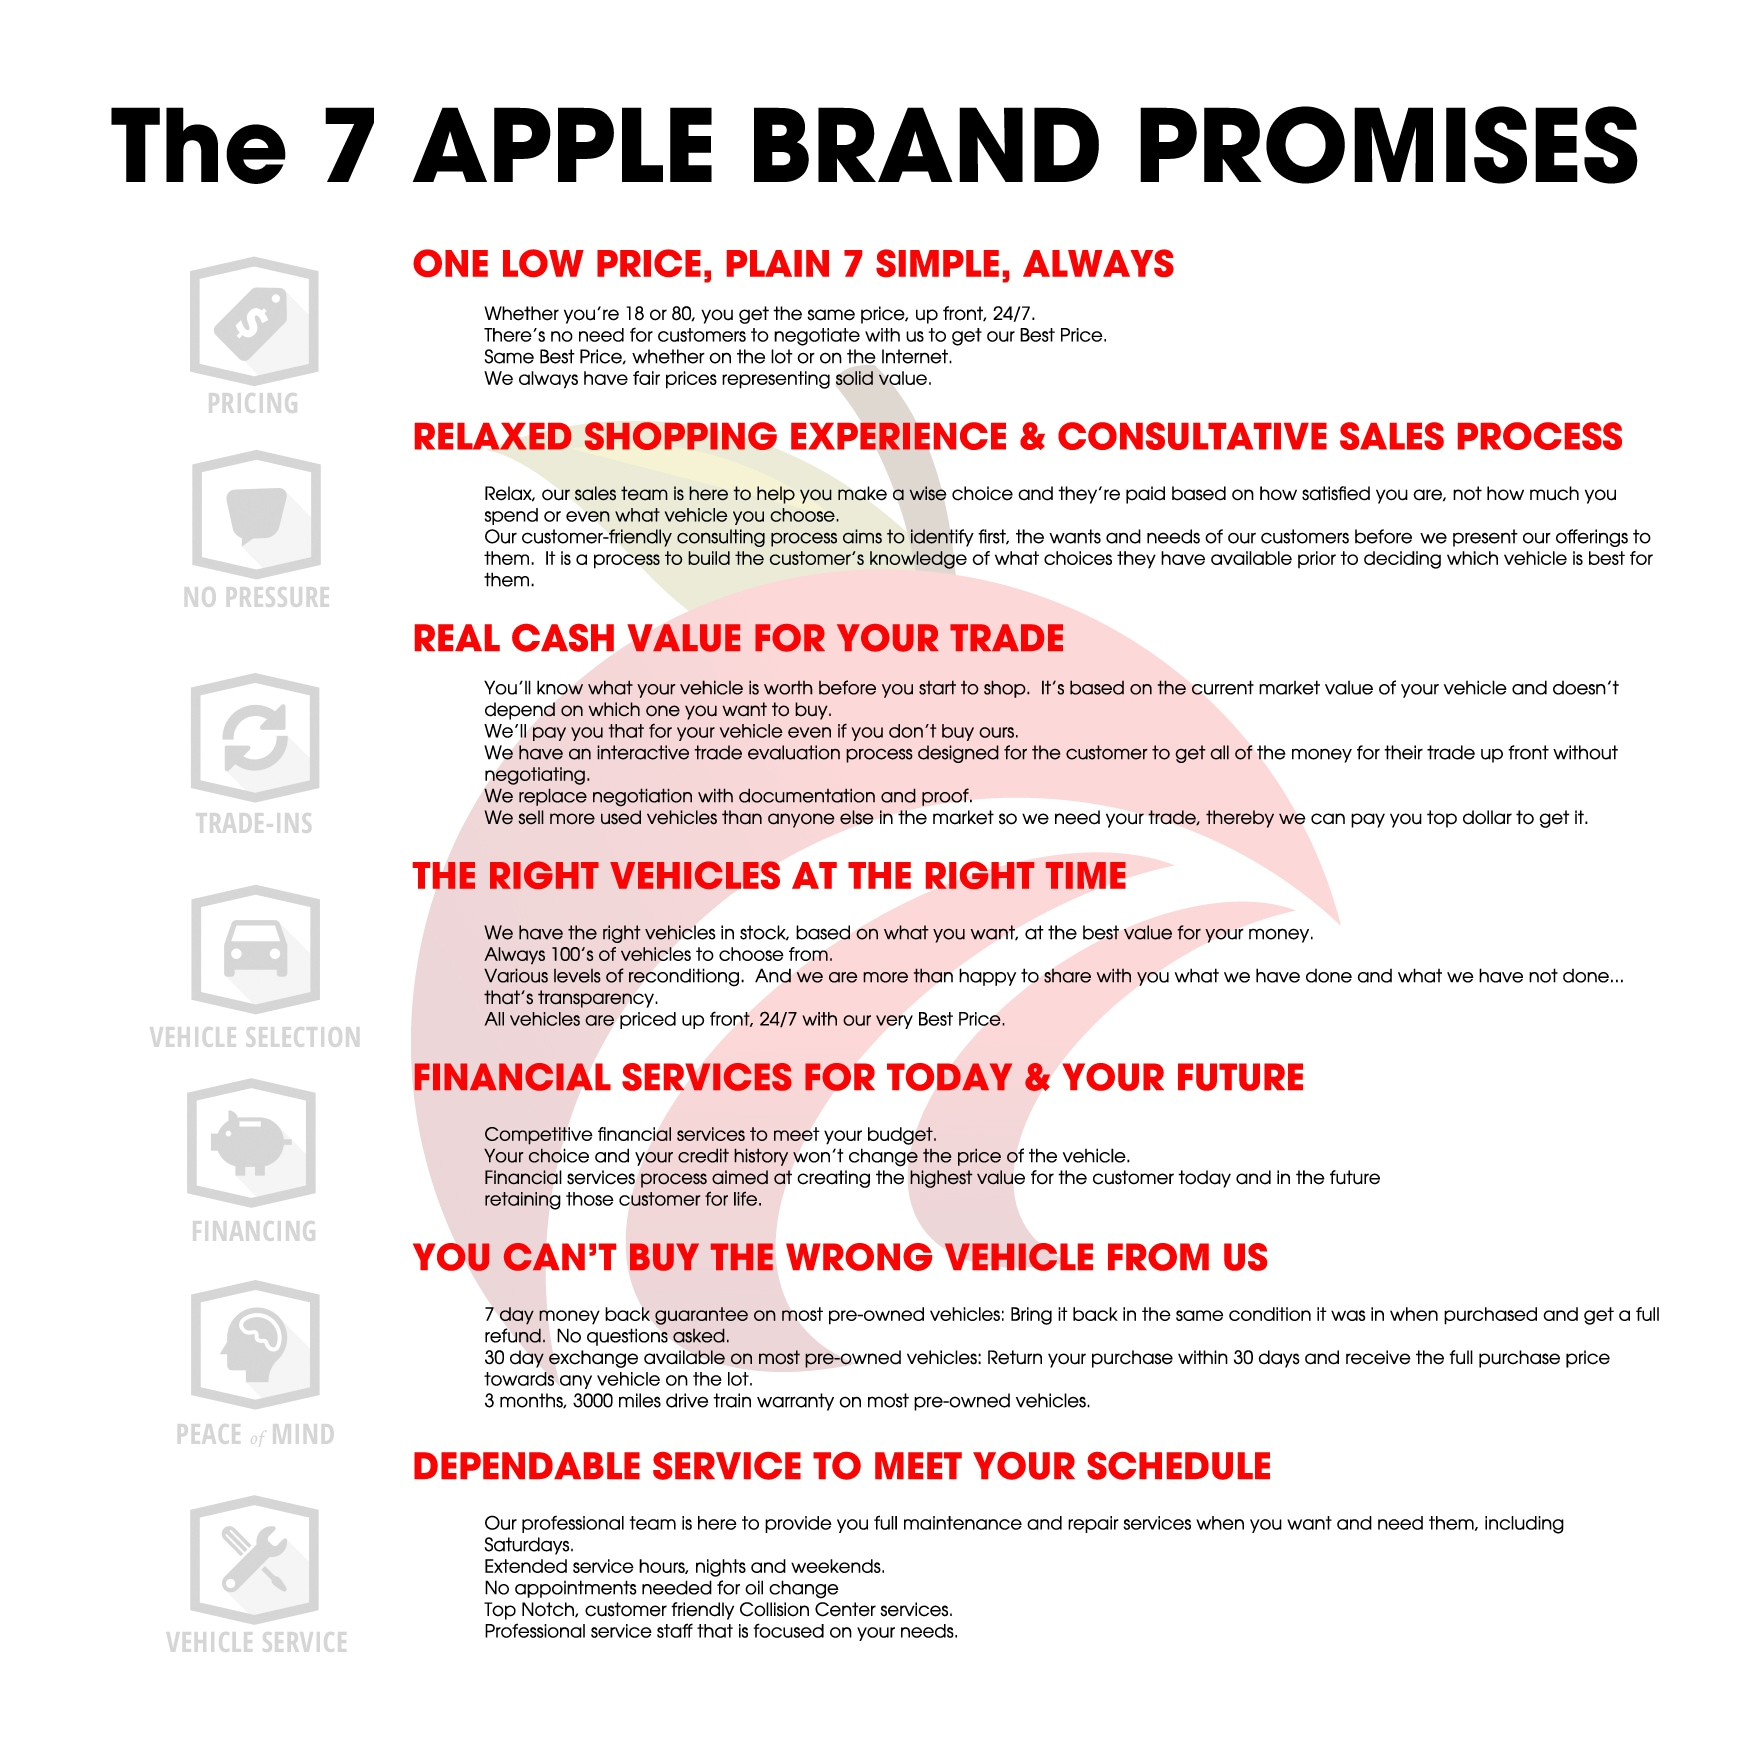 Apple brand promises